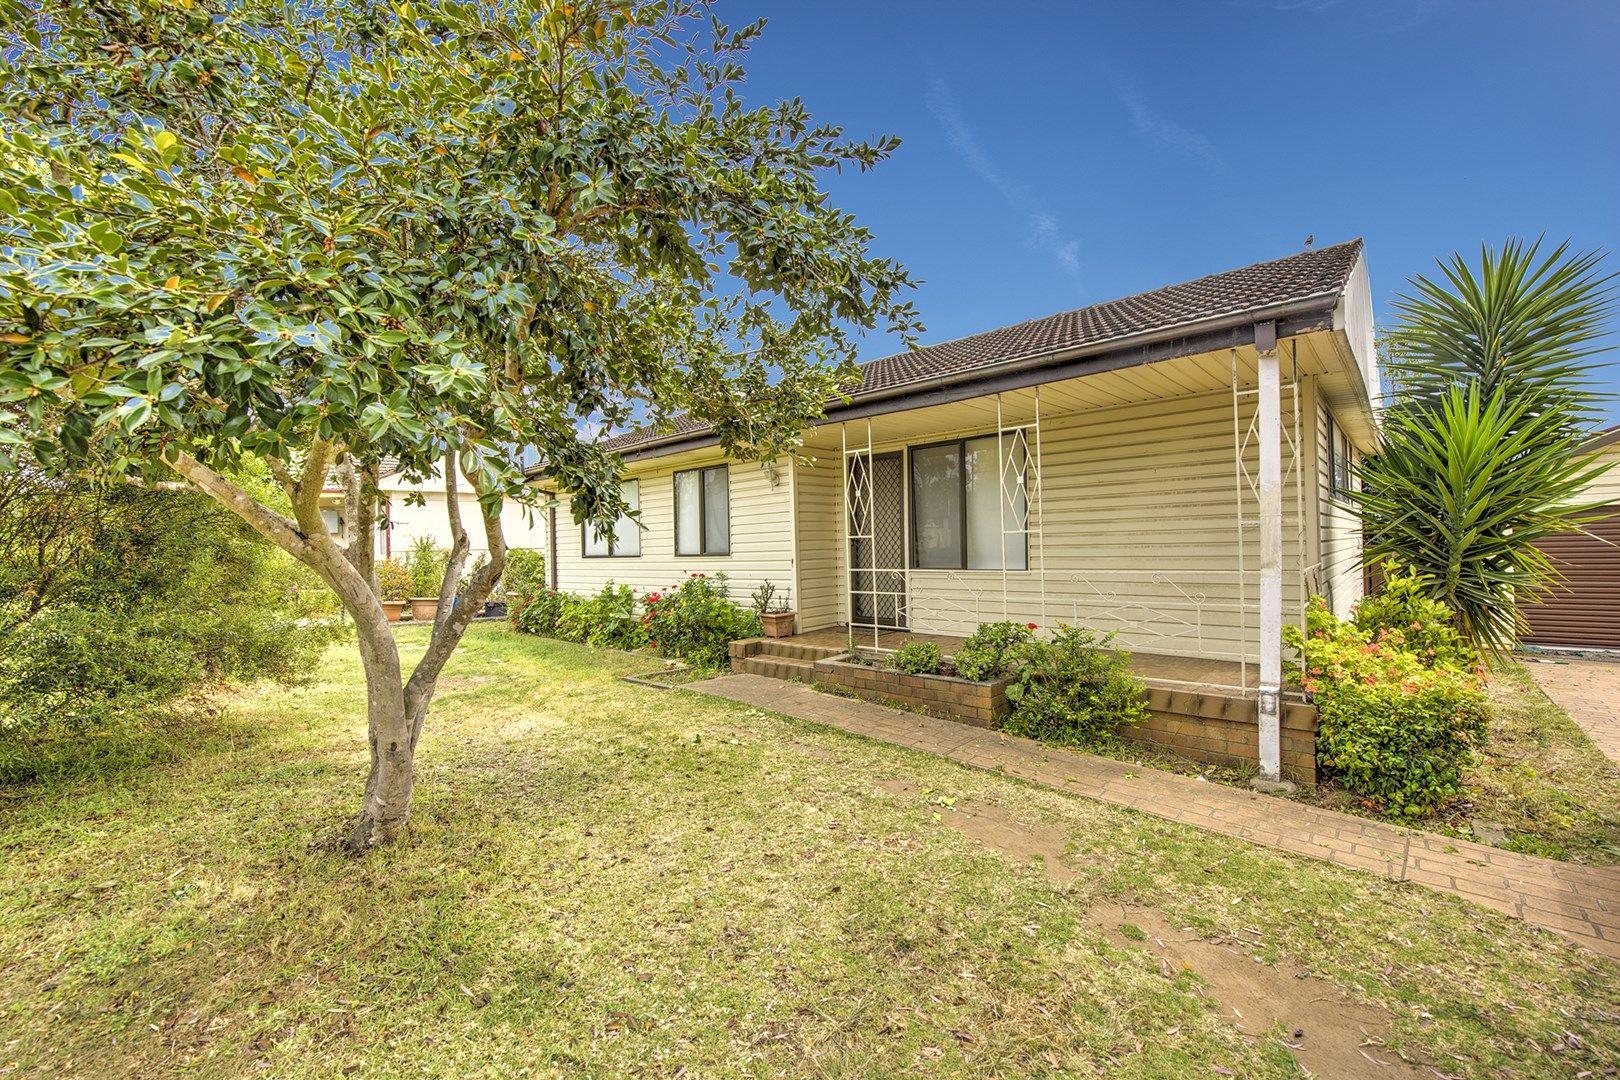 13 Seddon Place, Campbelltown NSW 2560, Image 0